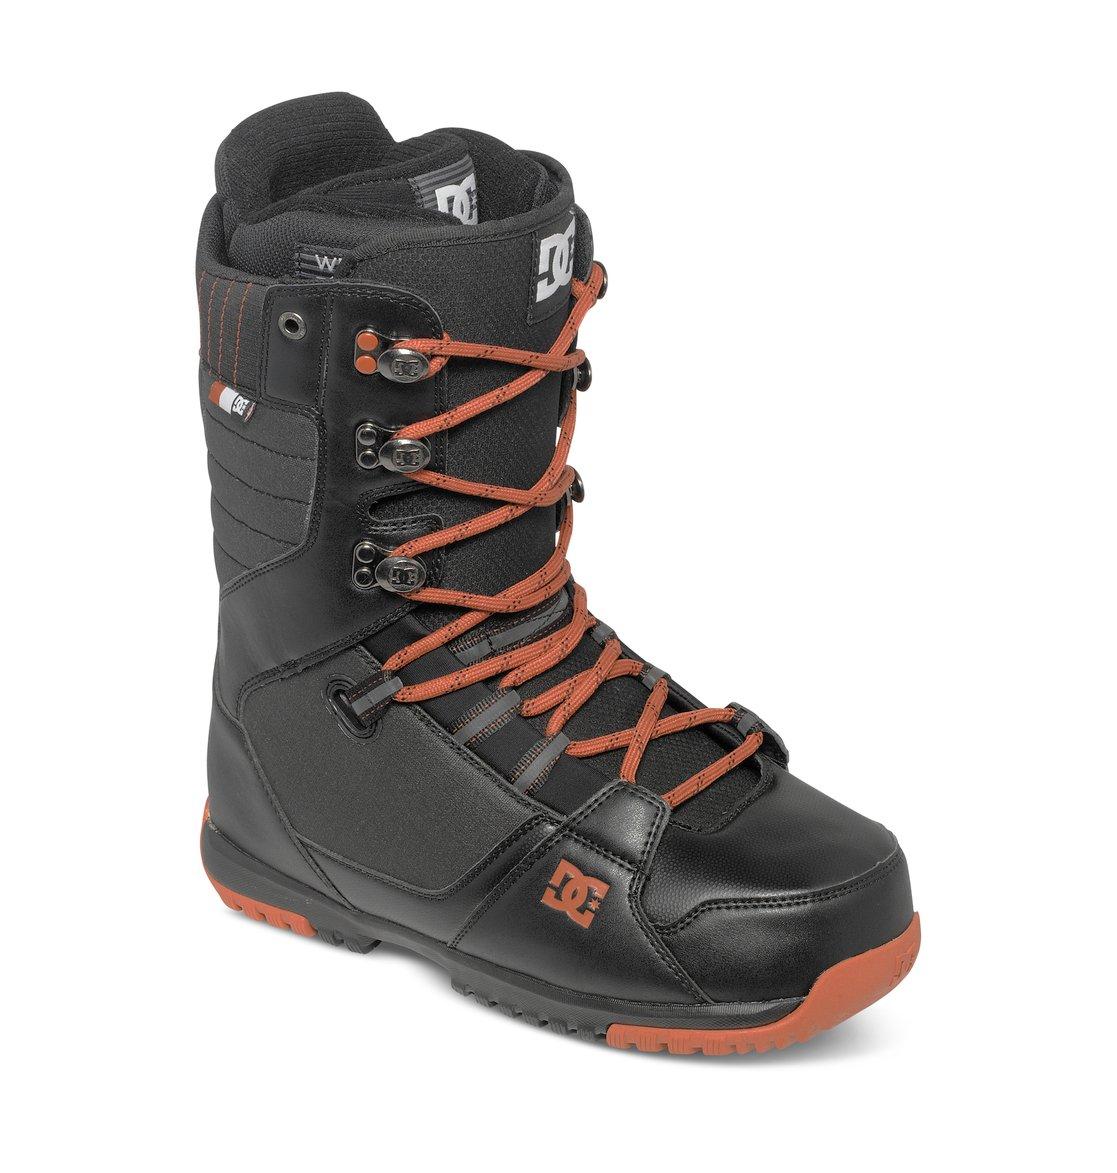 DC Men's Mutiny Snowboard Boot